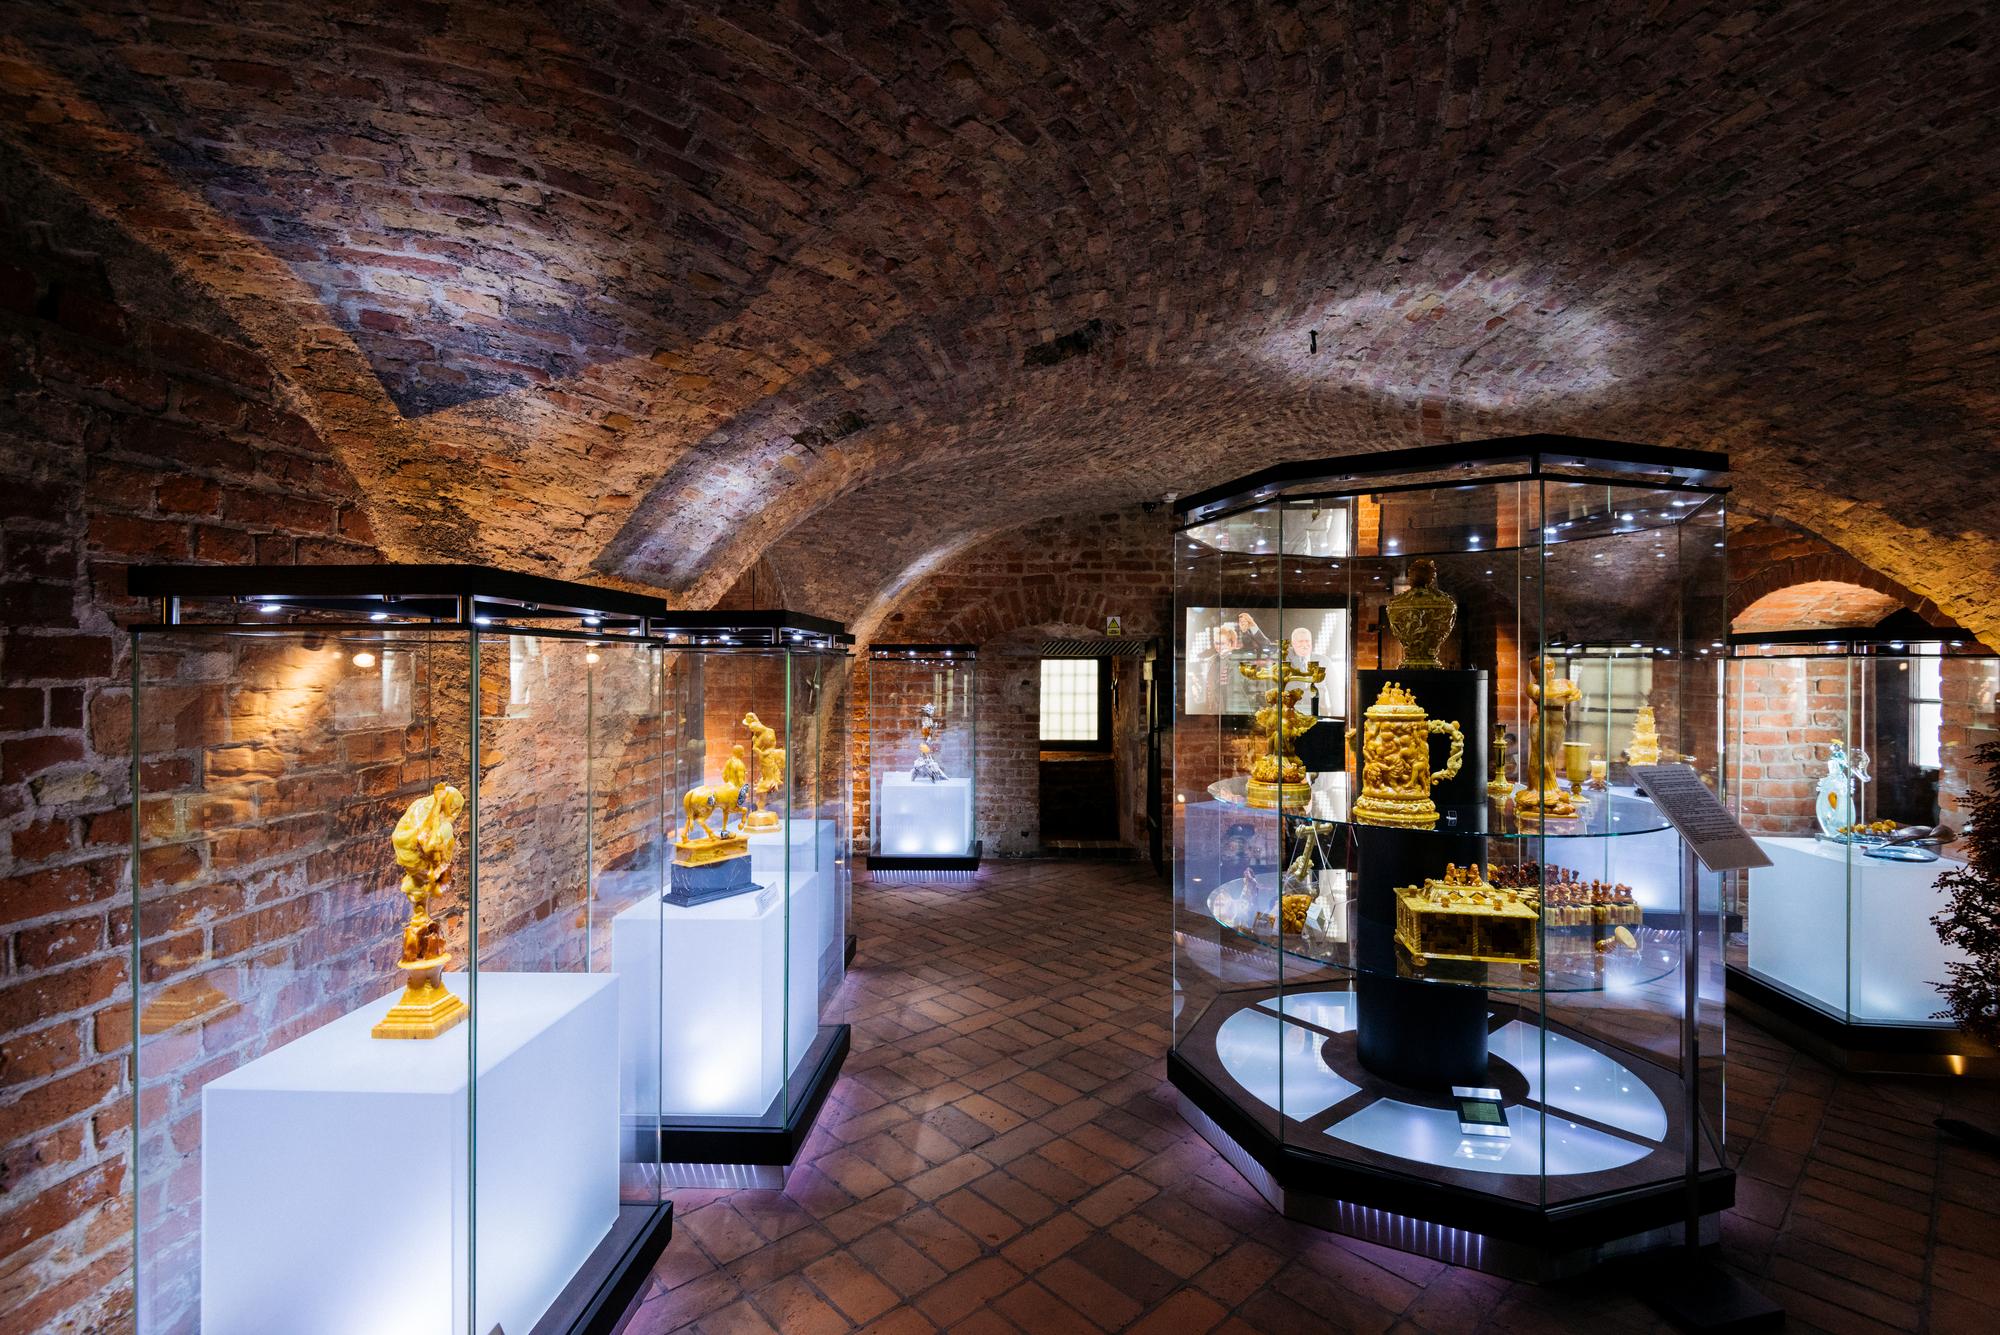 Gdansk Amber Museum